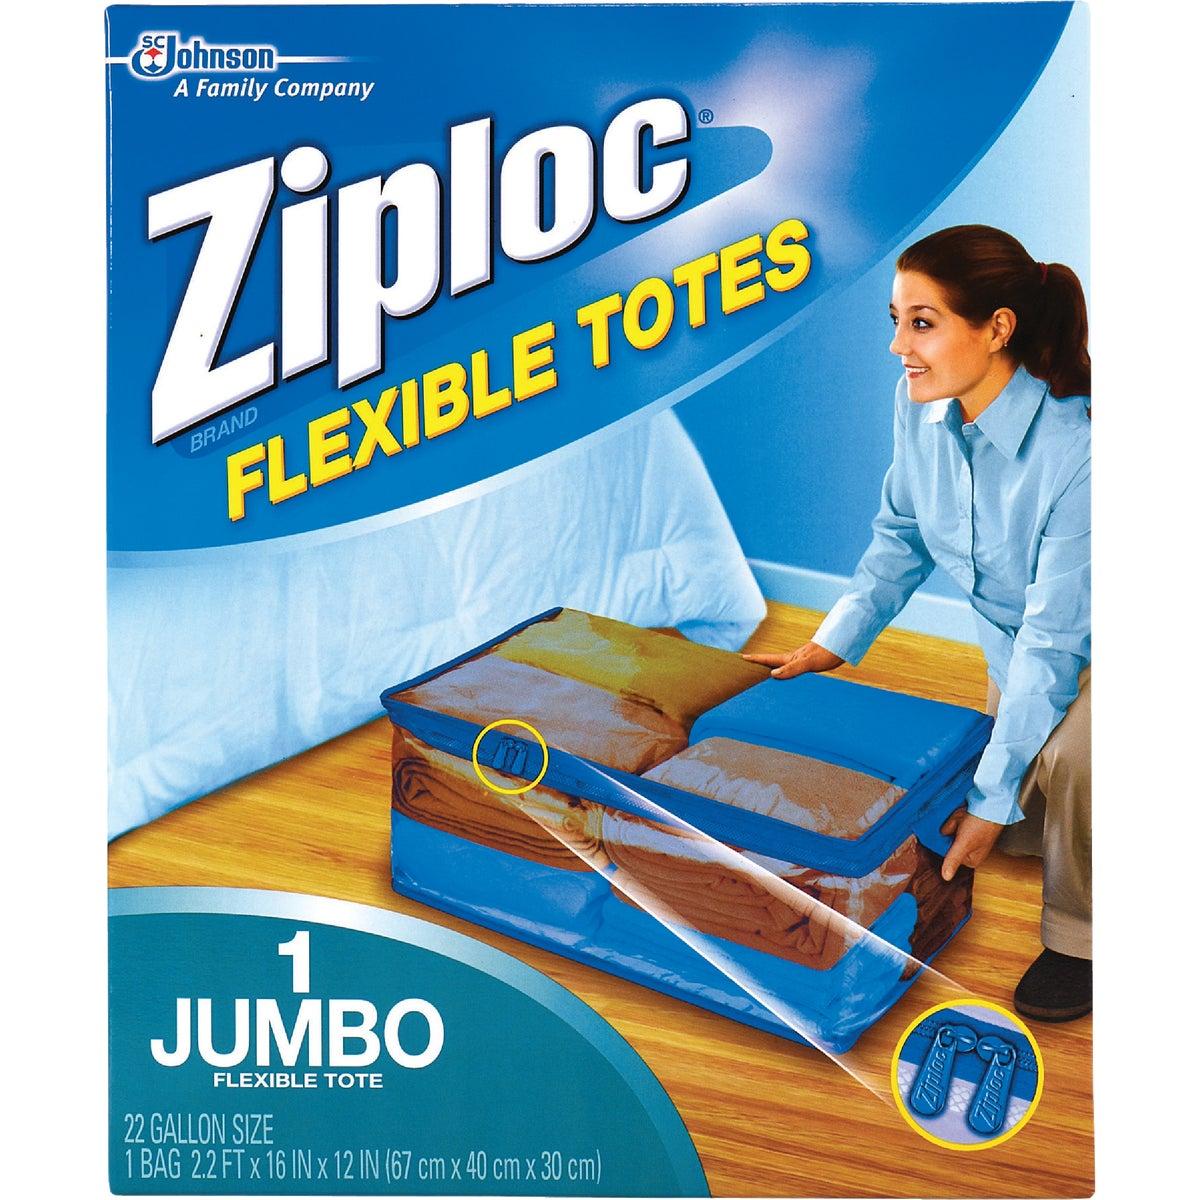 XXL ZIPLOC FLEX TOTE - 70162 by Sc Johnson